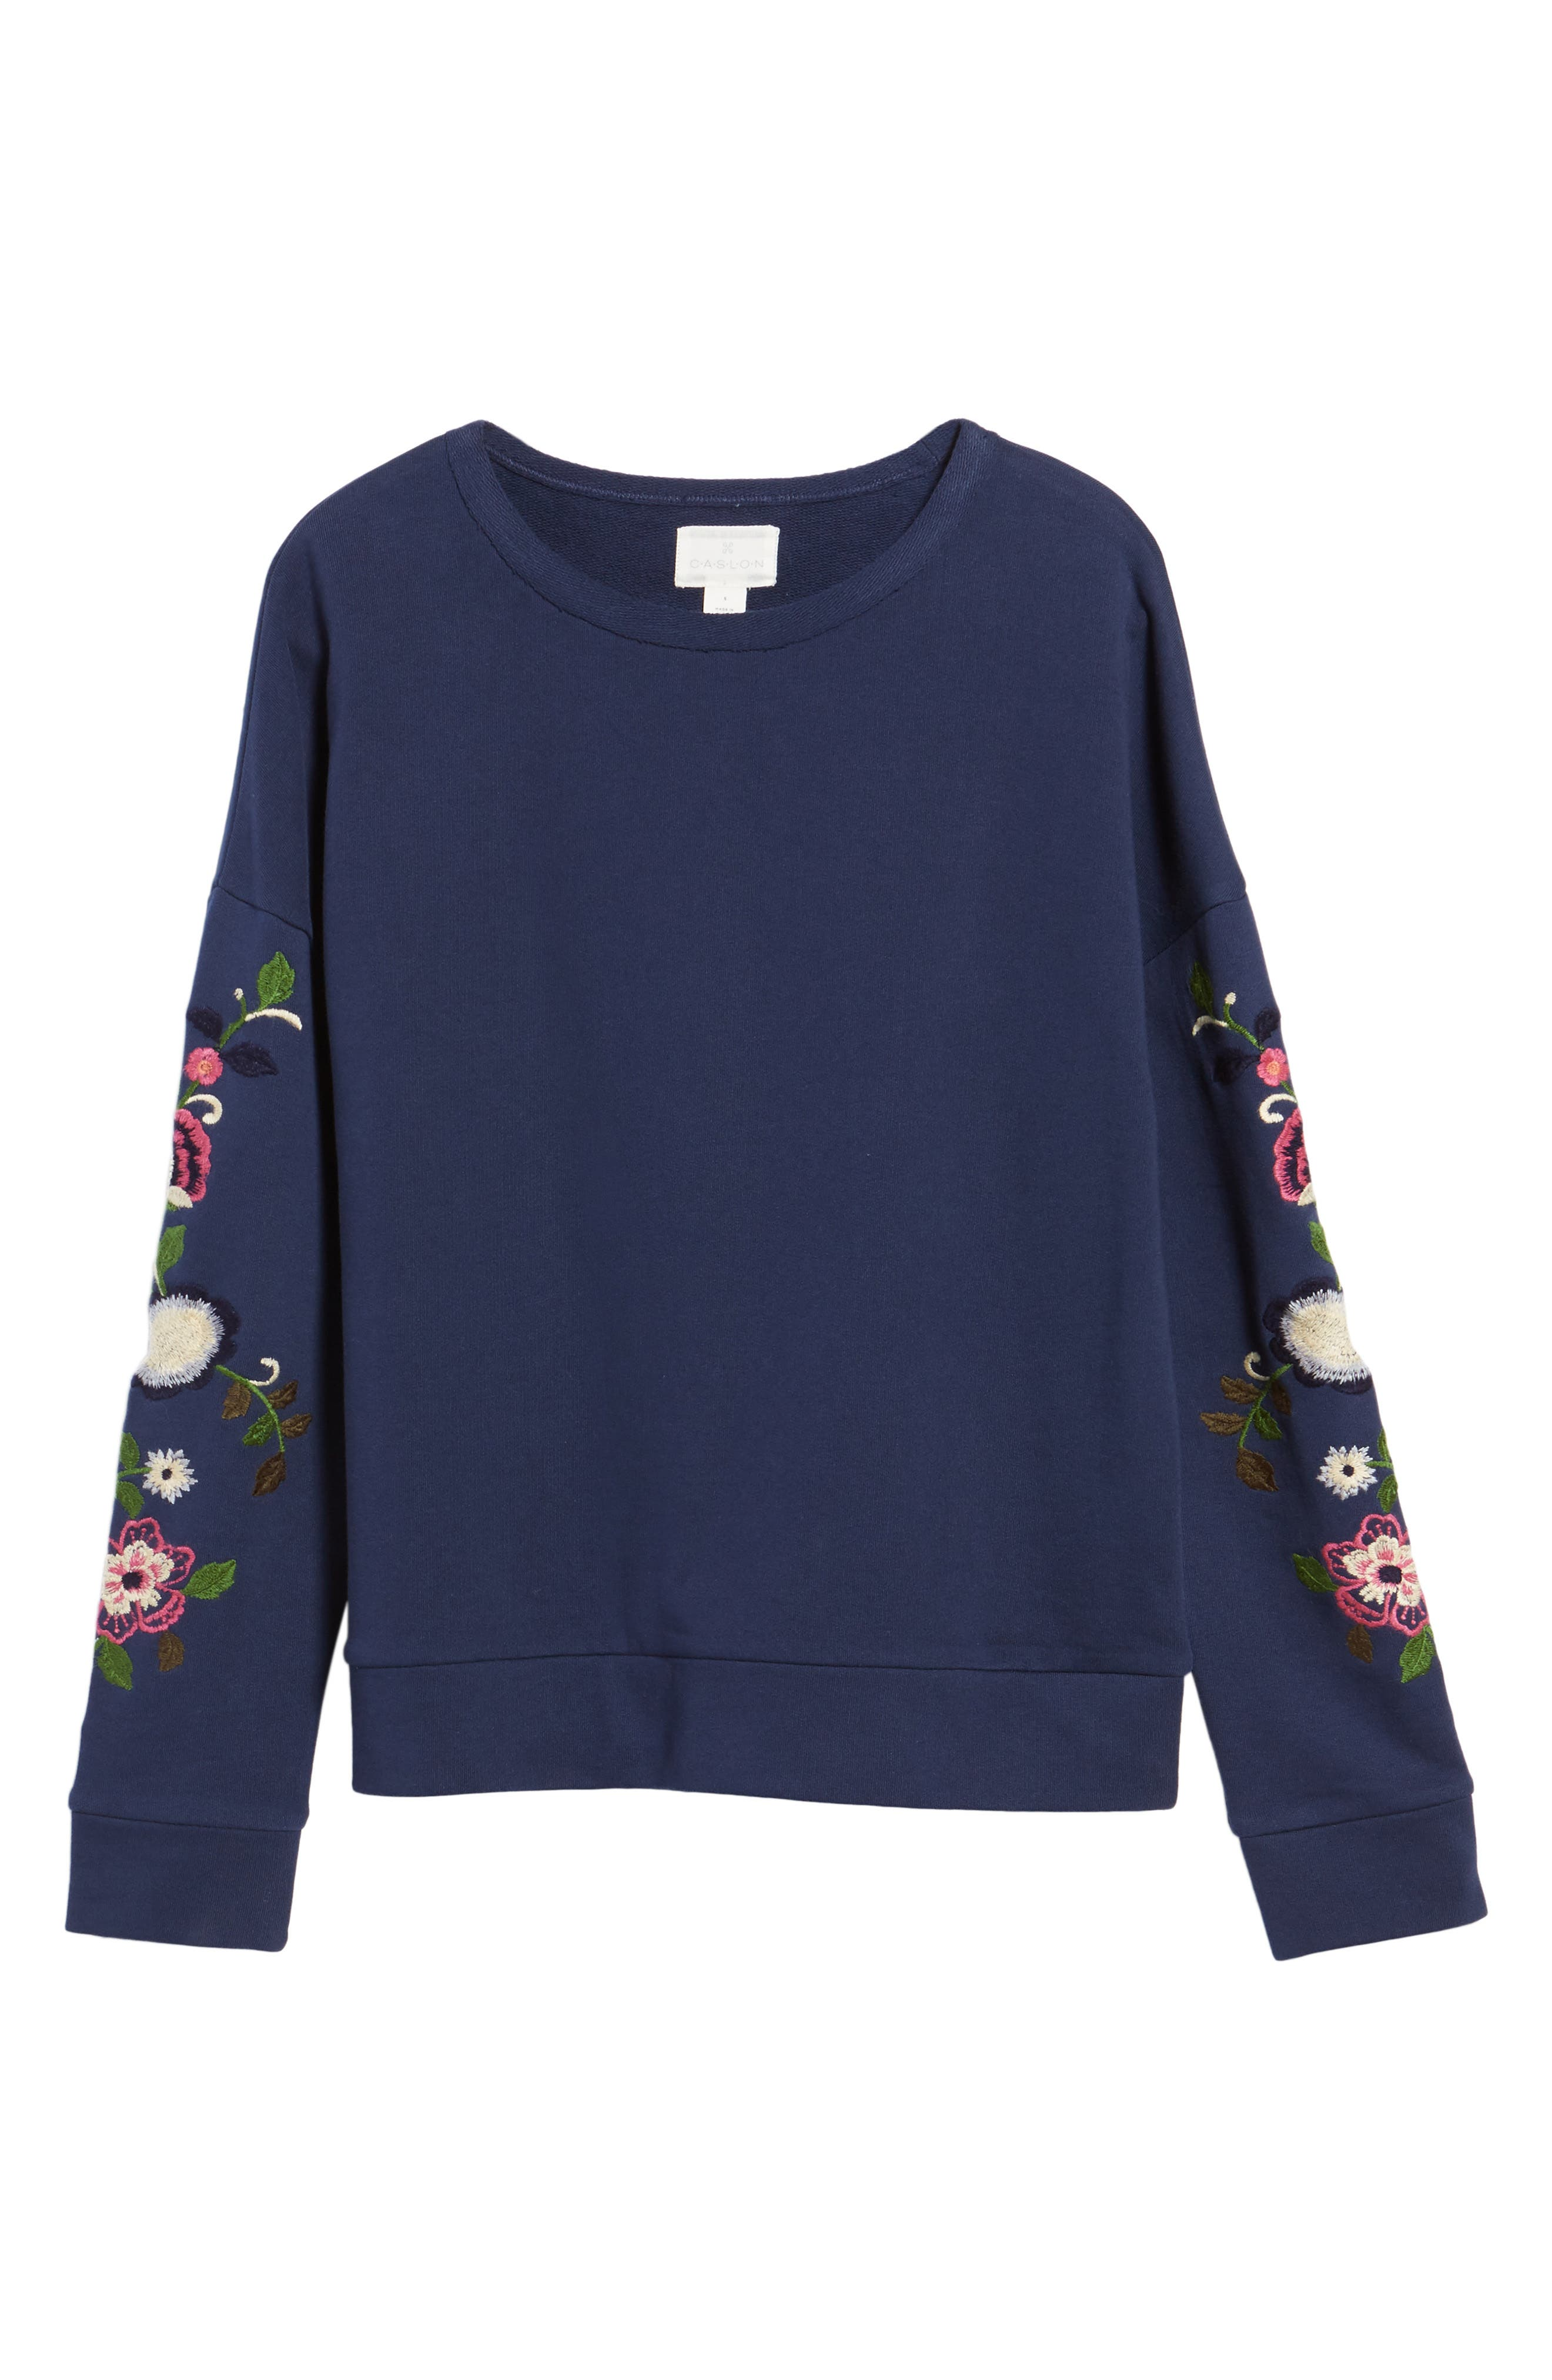 Embroidered Sleeve Sweatshirt,                             Alternate thumbnail 6, color,                             410